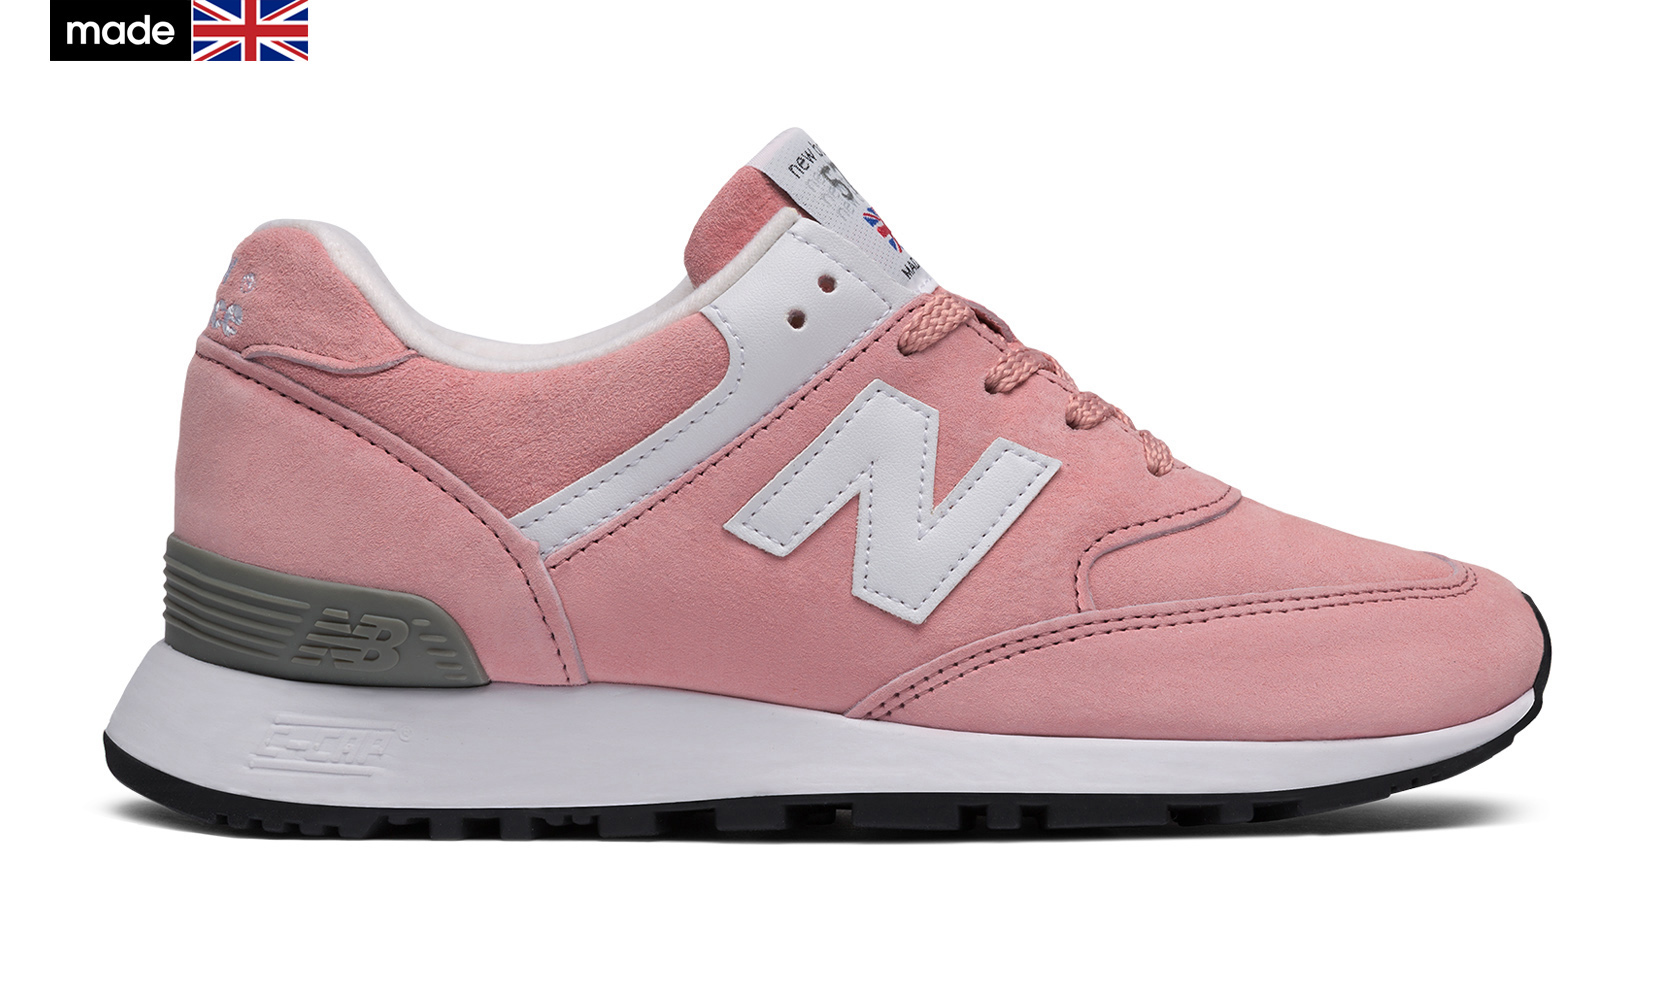 Жіноче взуття повсякденне New Balance 576  Made in UK W576PNK | New Balance